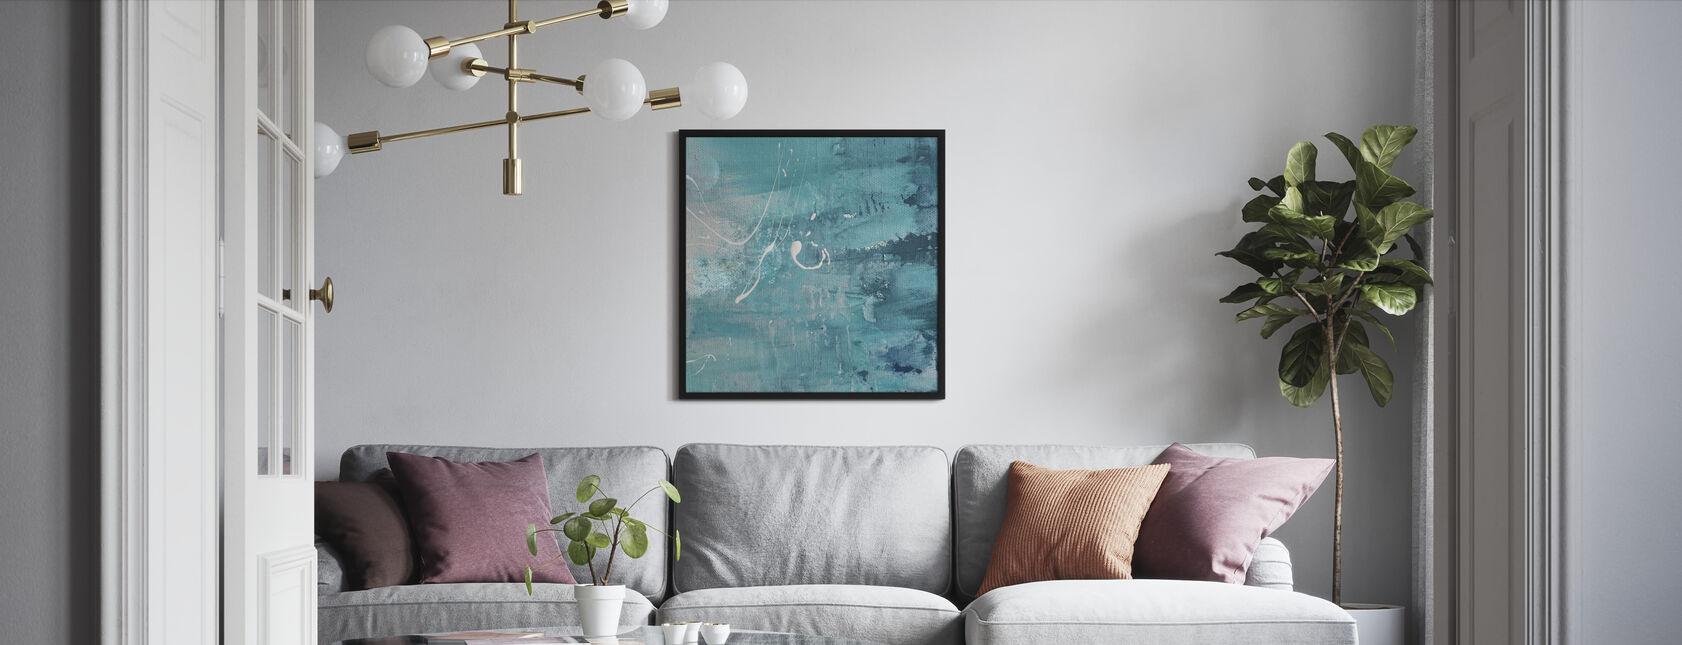 After Turquoise - Framed print - Living Room